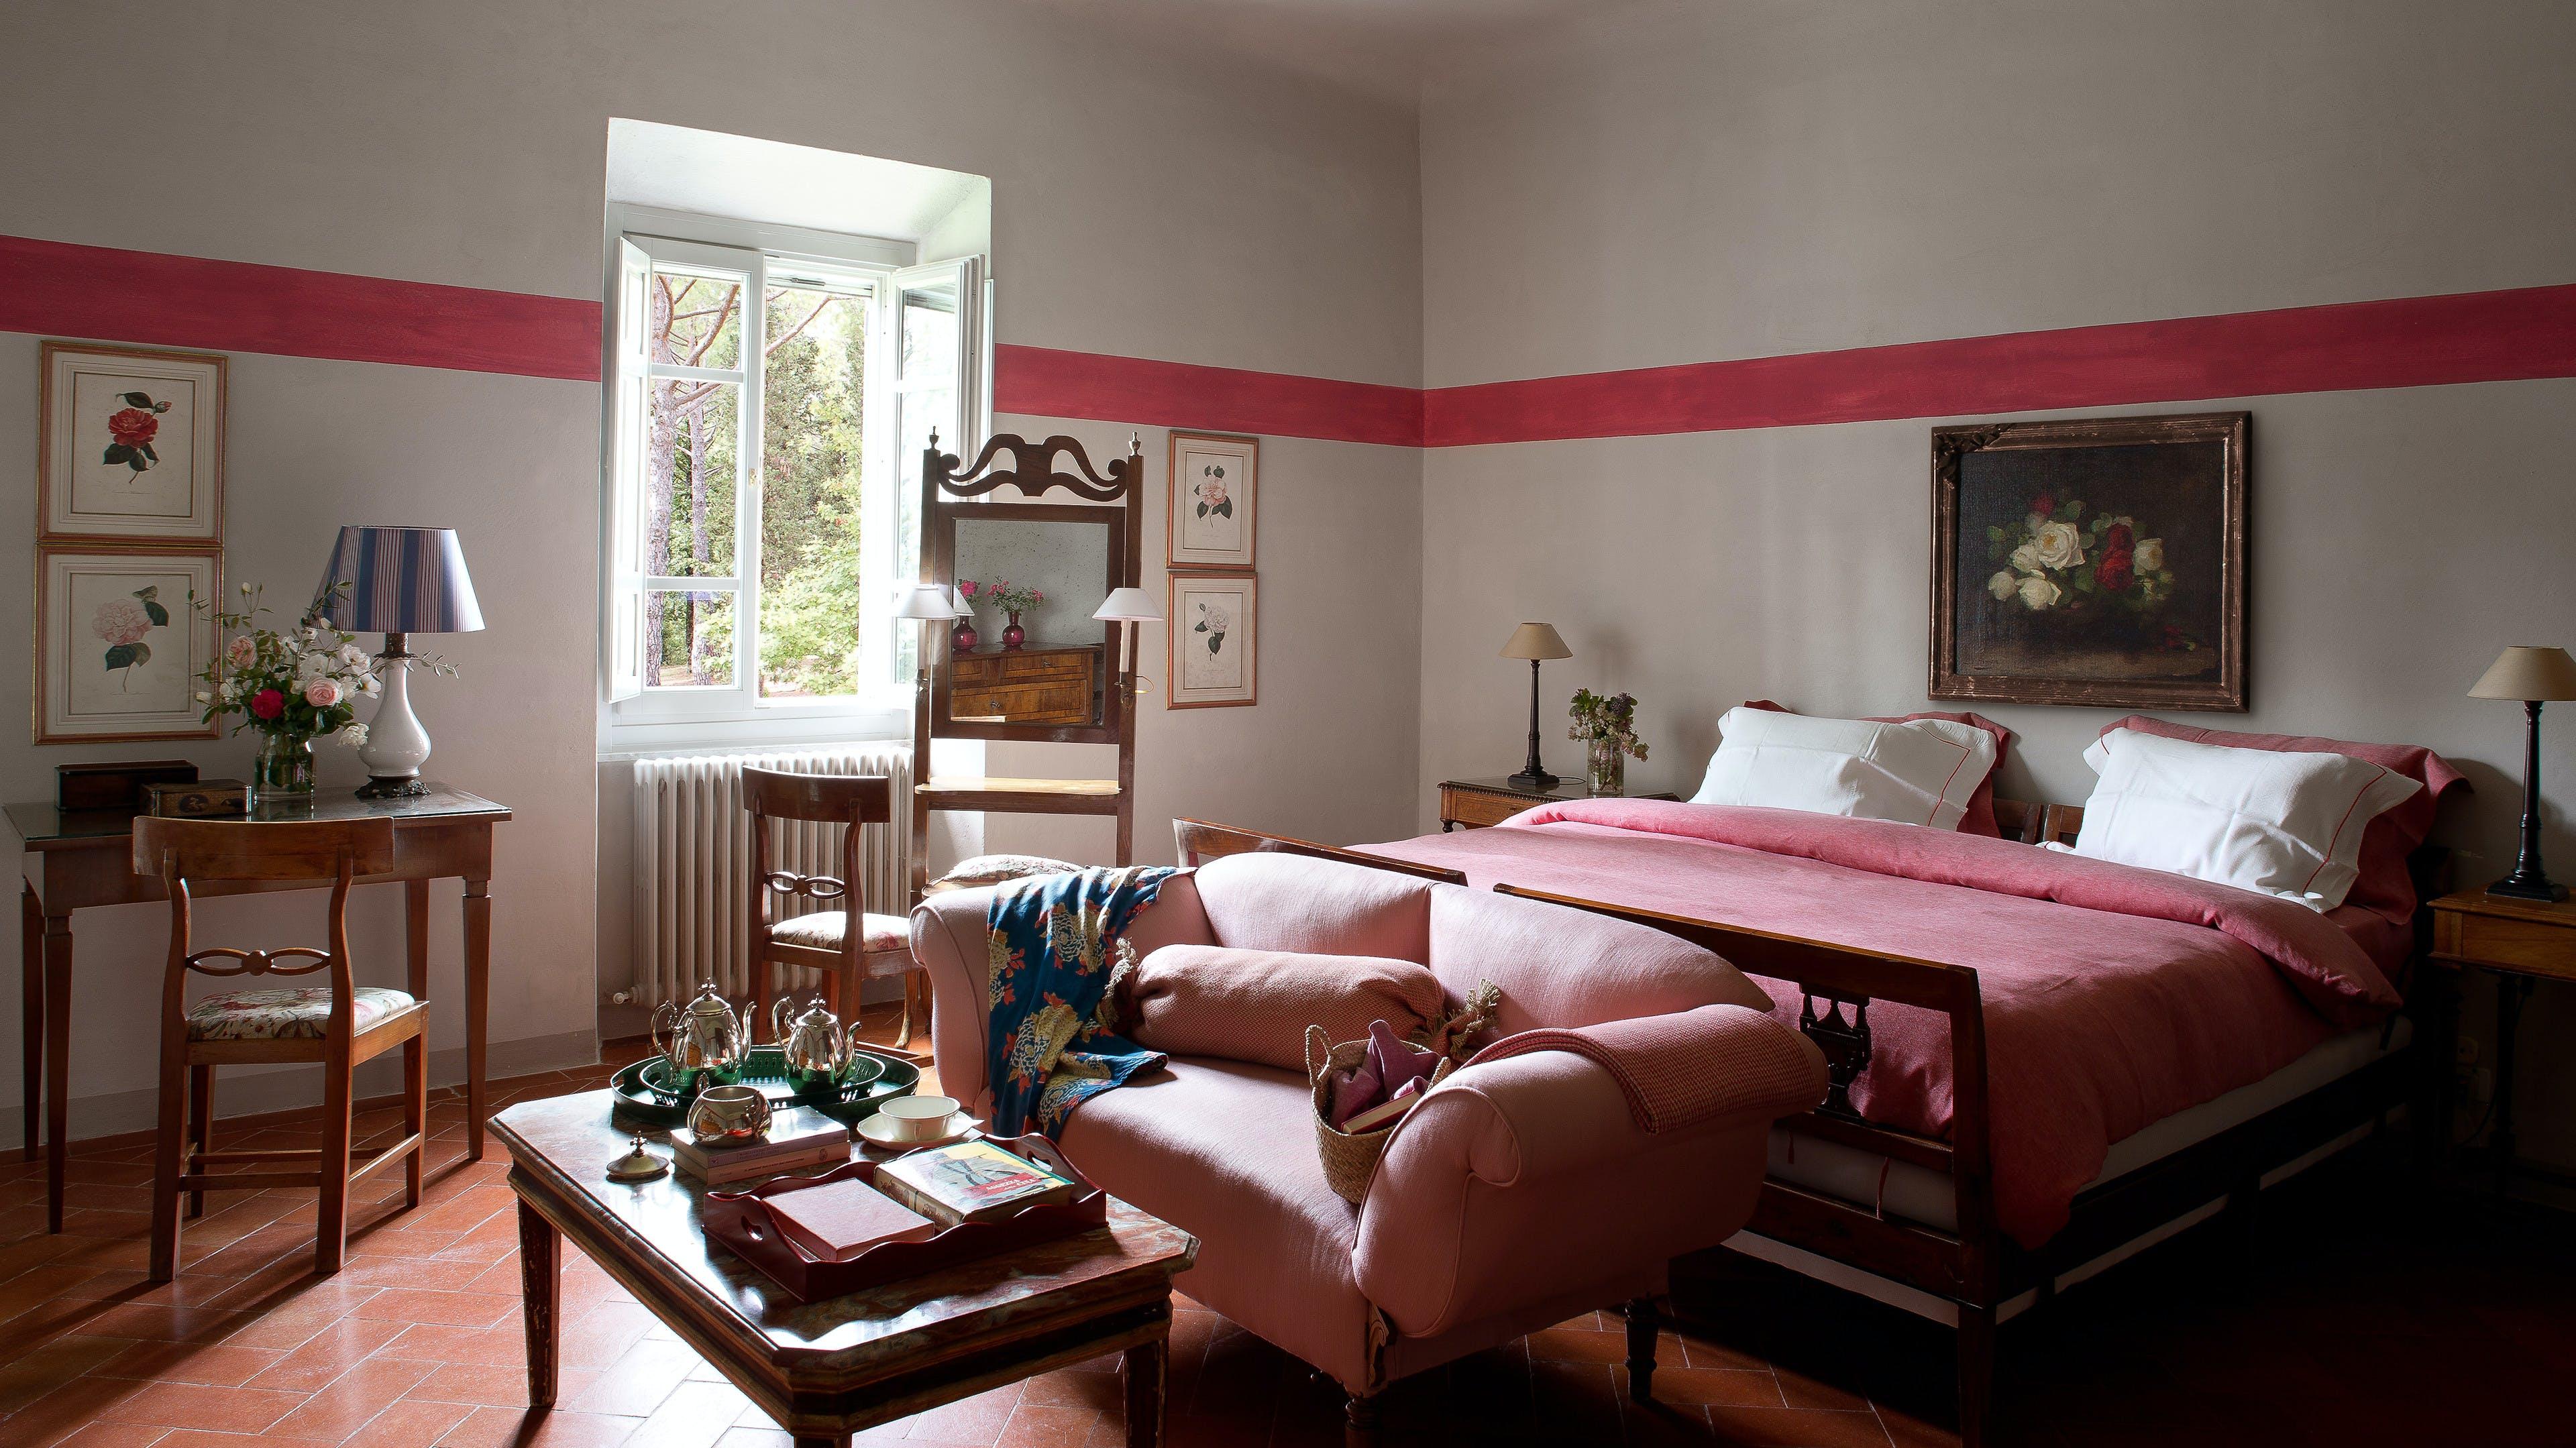 Classic Renaissance Villa, Italy -  - New York City Townhouse Real Estate